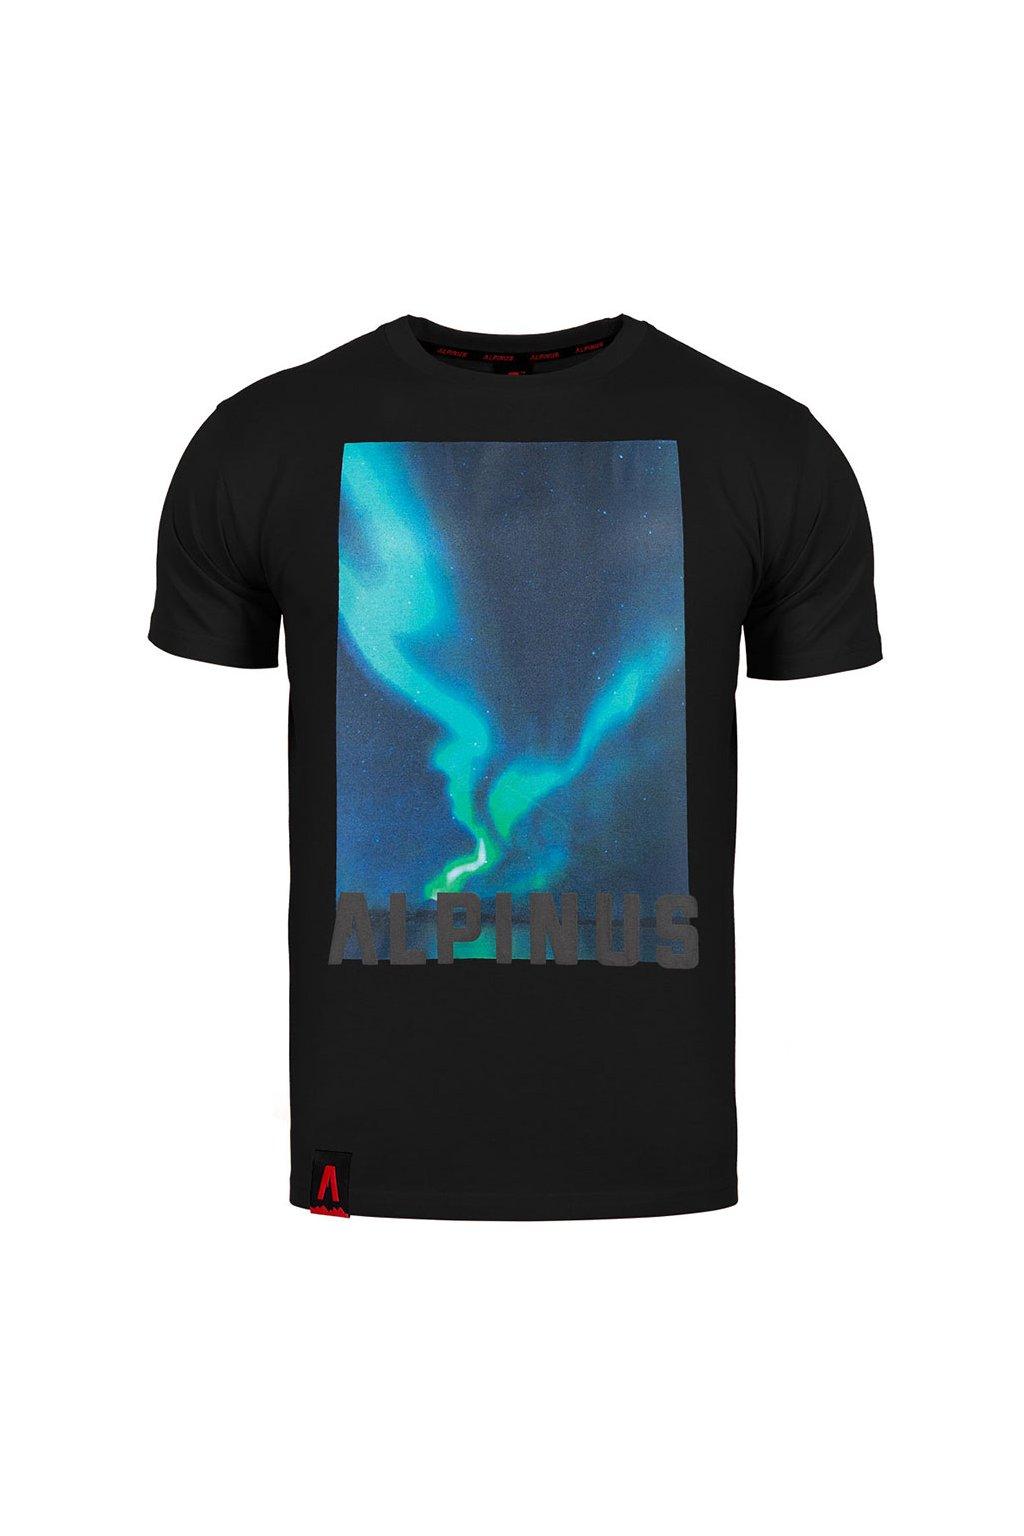 Pánske tričko Alpinus Cordillera čierne ALP20TC0009